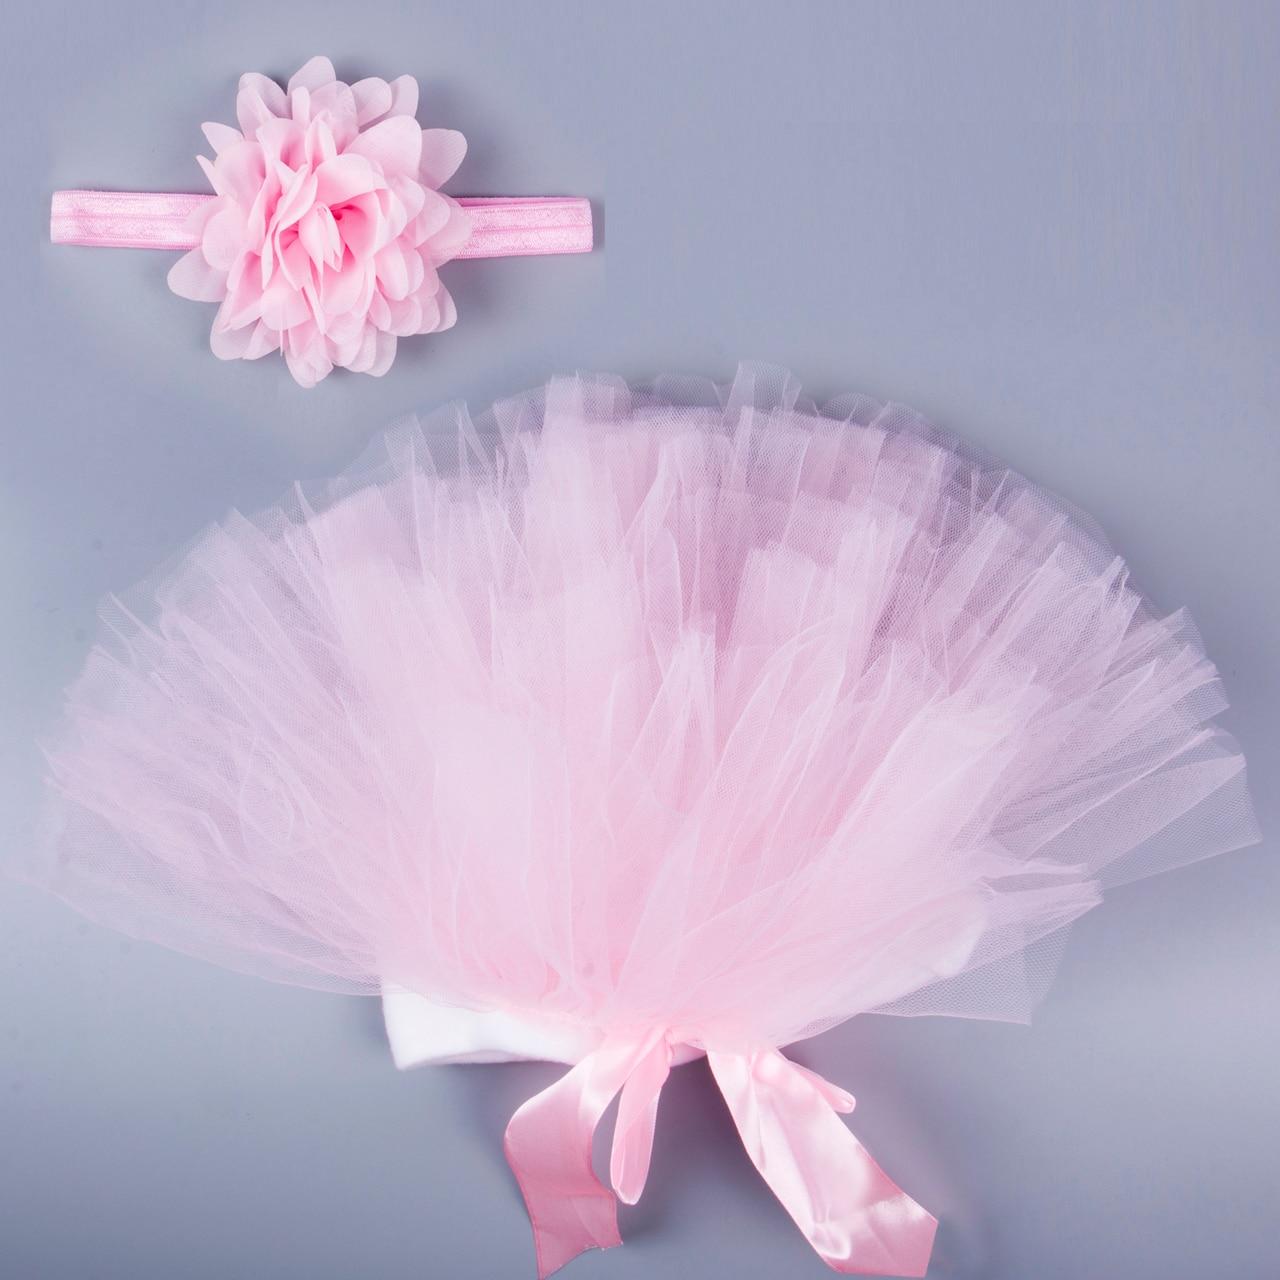 0-24M Newborn Toddler Infant Baby Tutu Clothes Skirt Headdress Flower Photography Prop 2PCS Outfit 0-24M